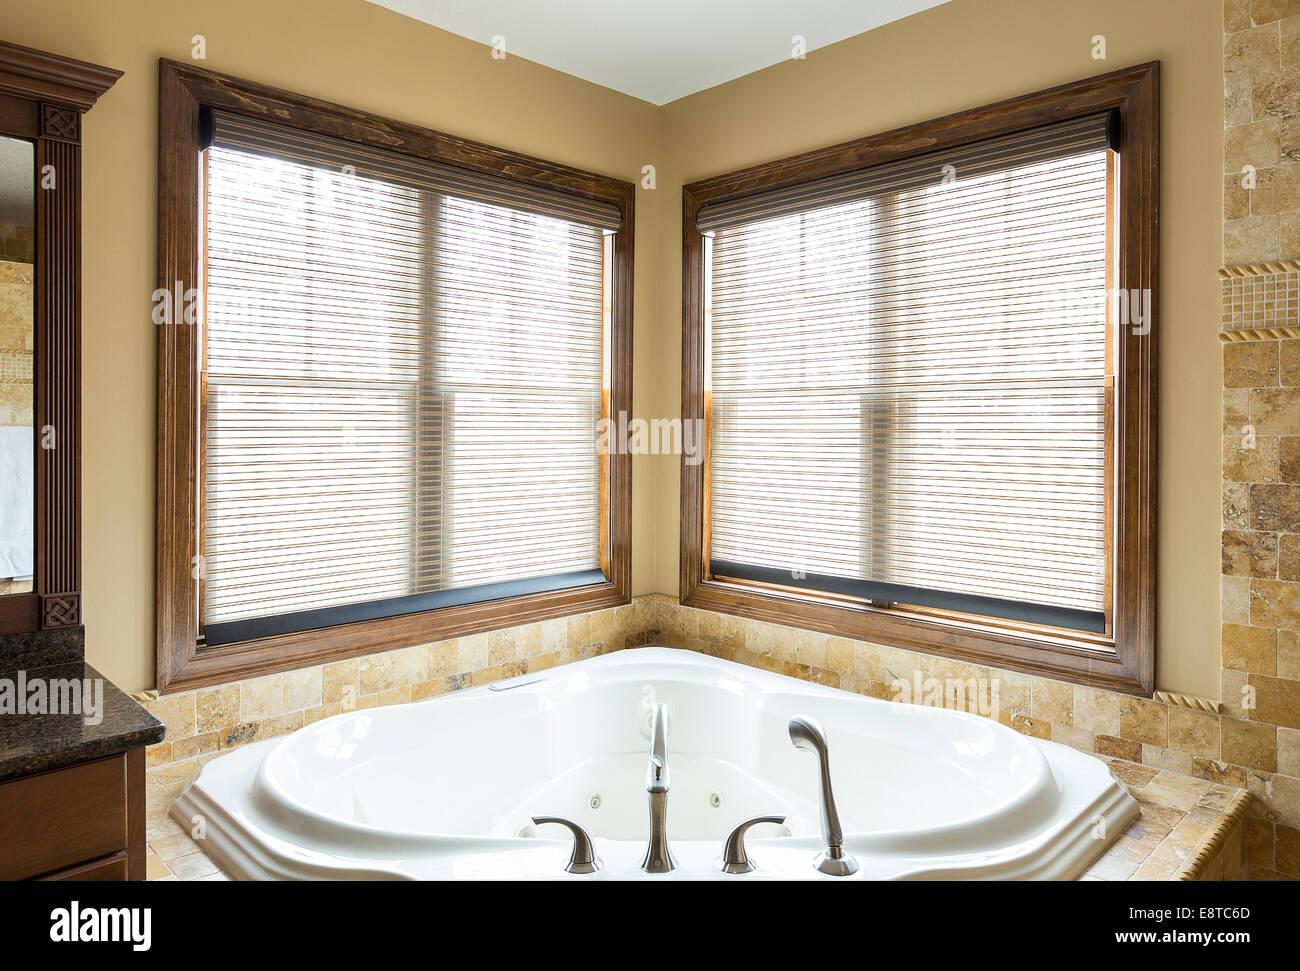 . Luxury bathtub and windows in corner of modern bathroom Stock Photo